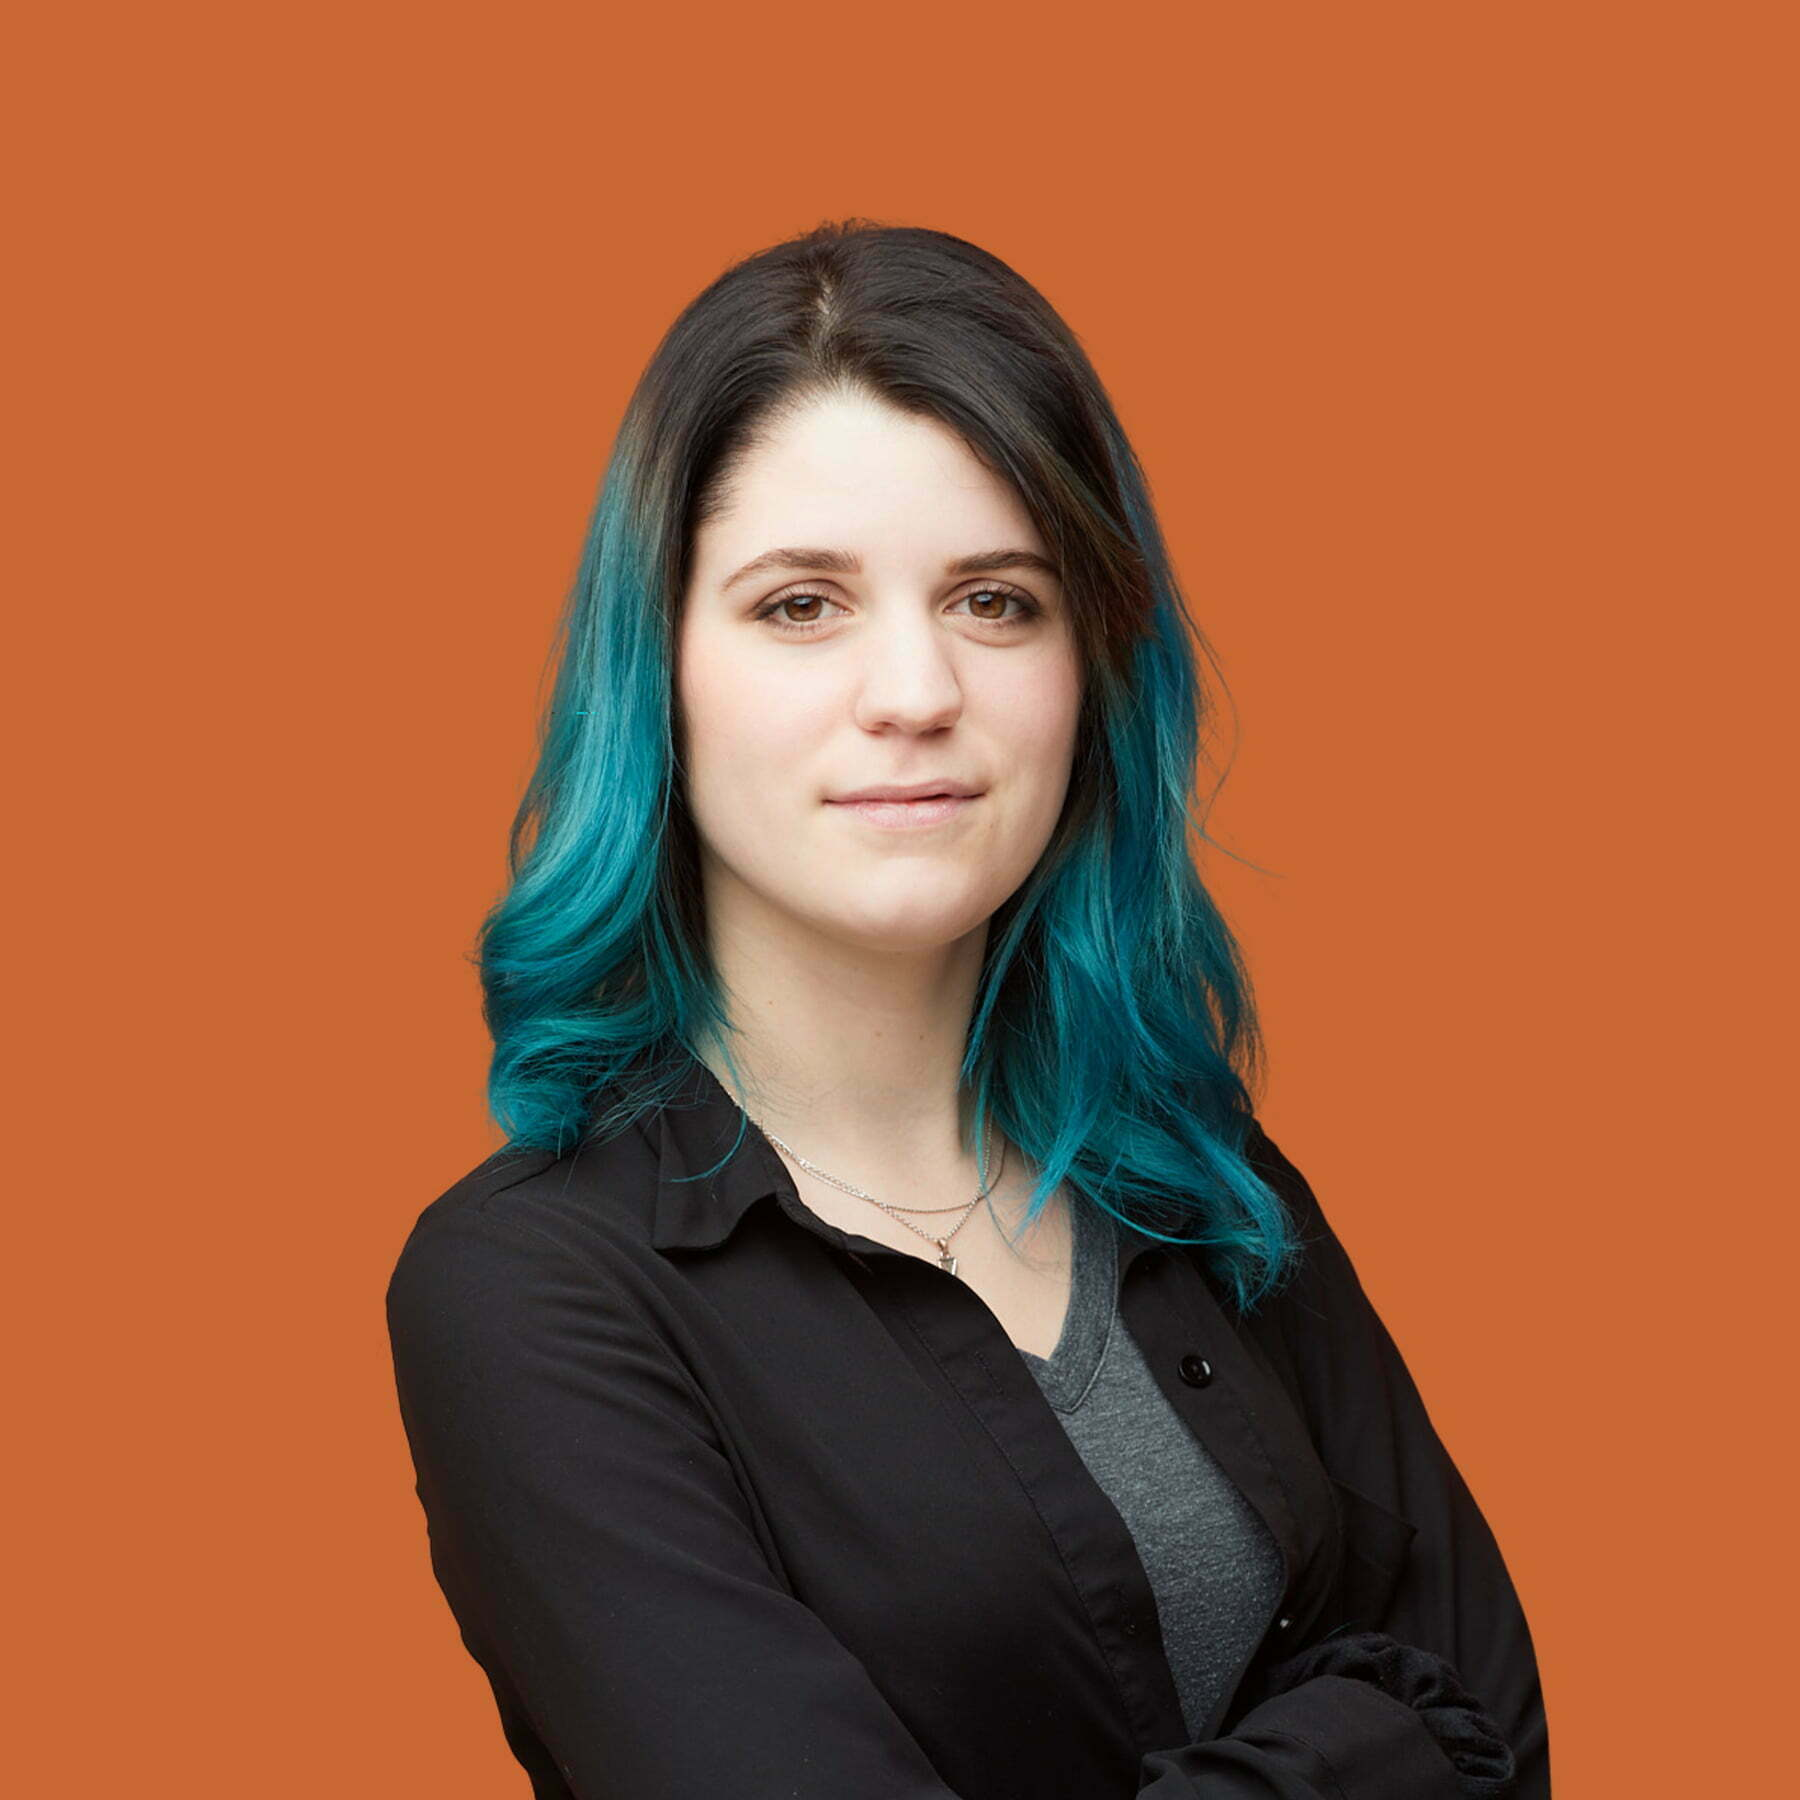 Amelie-orange